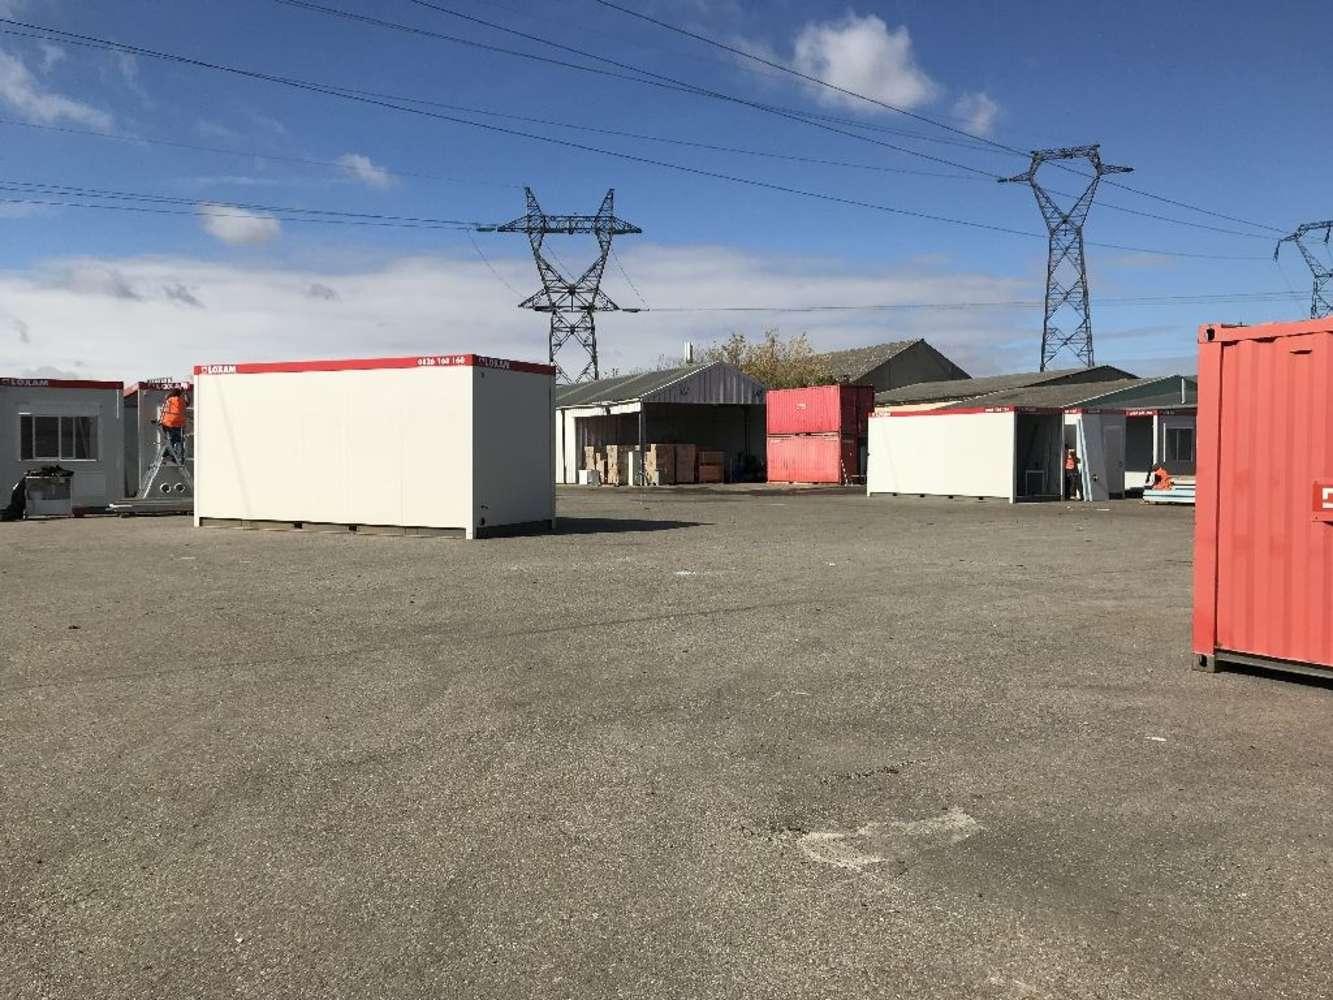 Activités/entrepôt Meyzieu, 69330 - Location locaux d'activité Meyzieu - 10529100